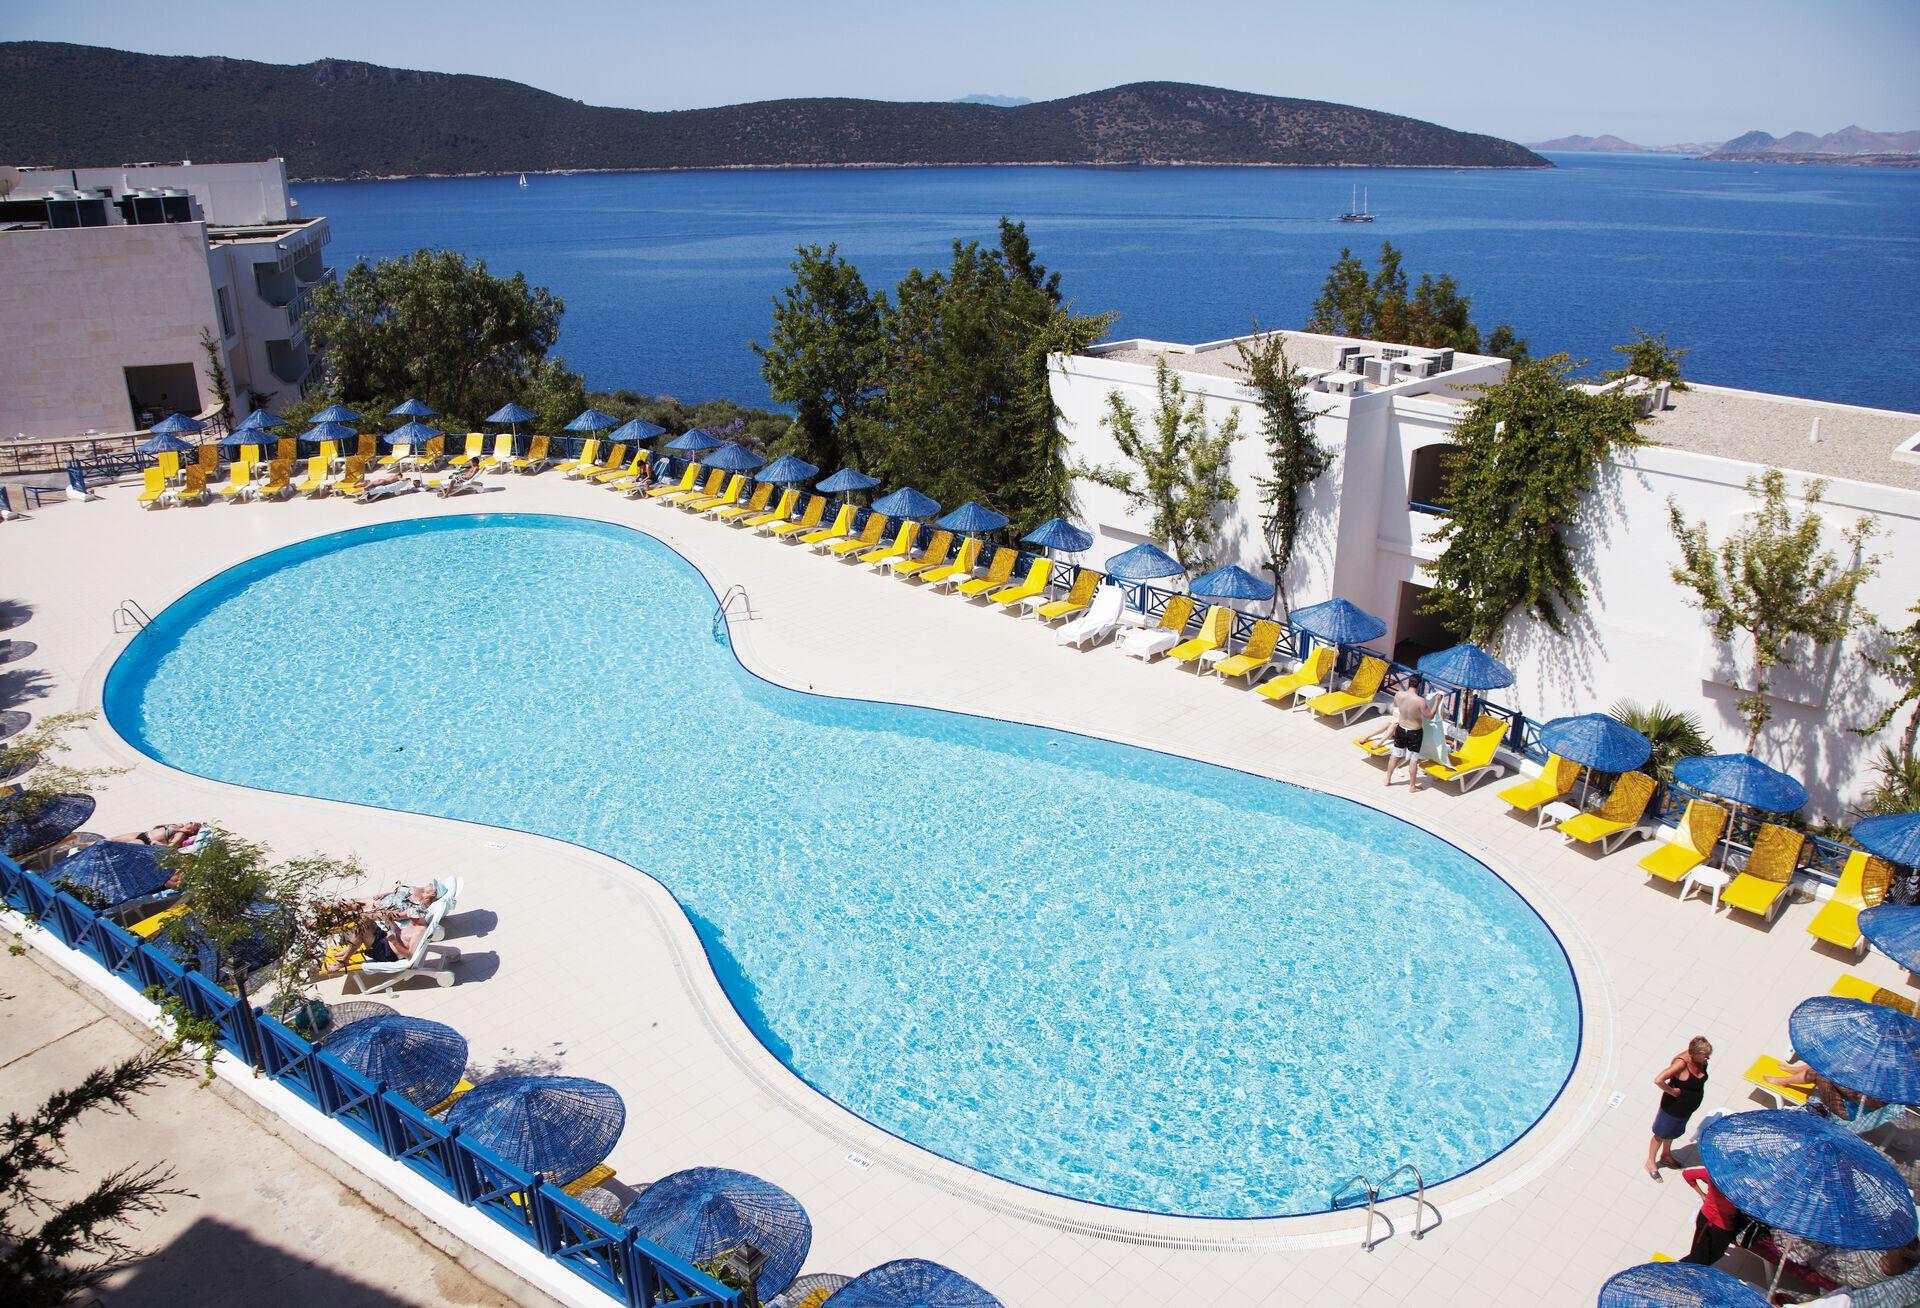 Turquie - Bodrum - Hôtel Bodrum Holiday Resort 4*